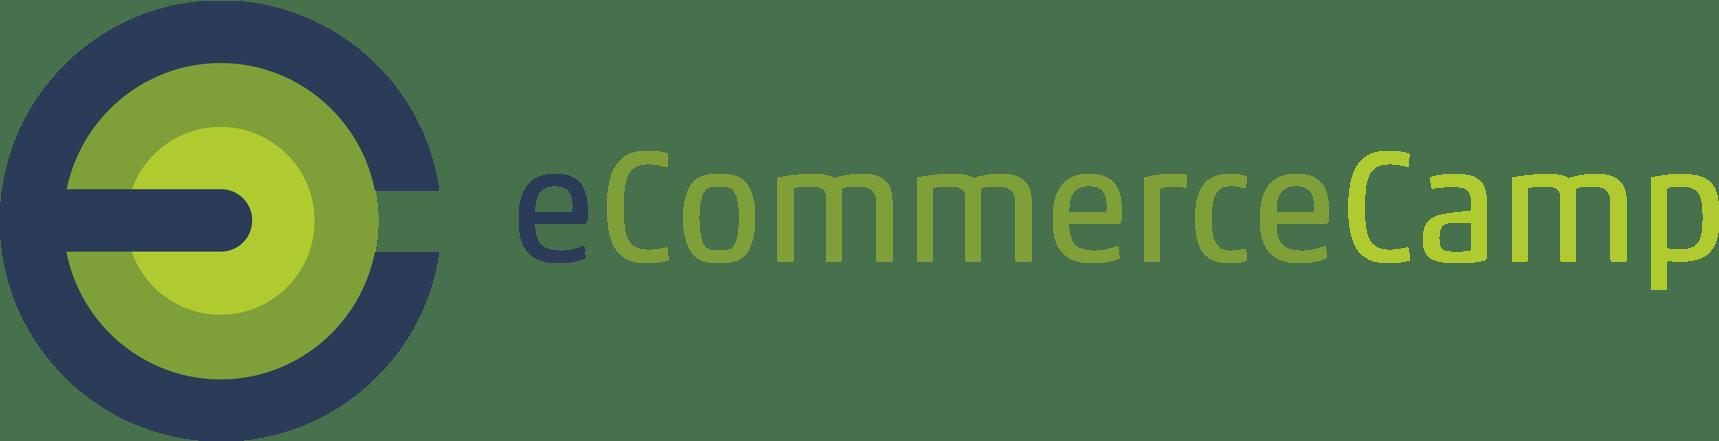 eCommerceCamp Logo